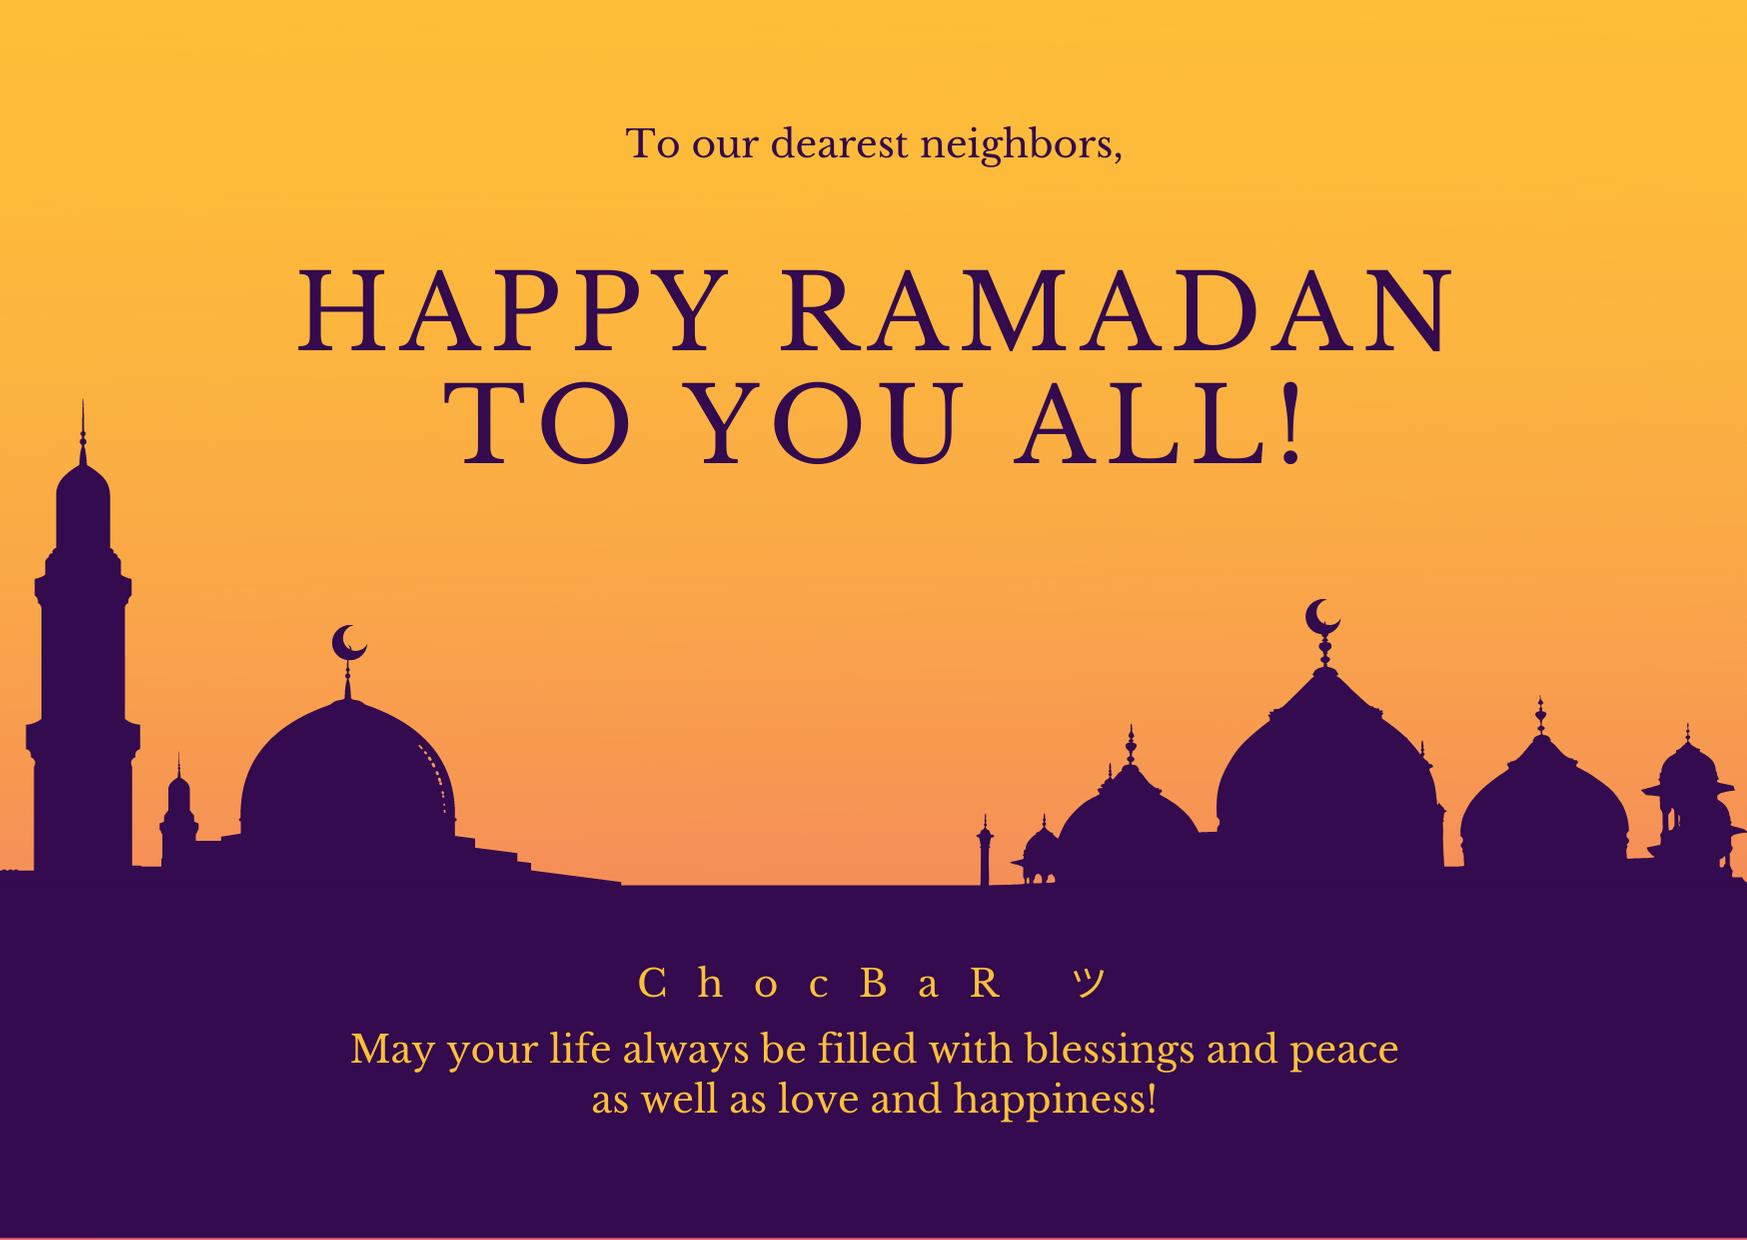 Eid Mubarak Meaning In English Eid Mubarak